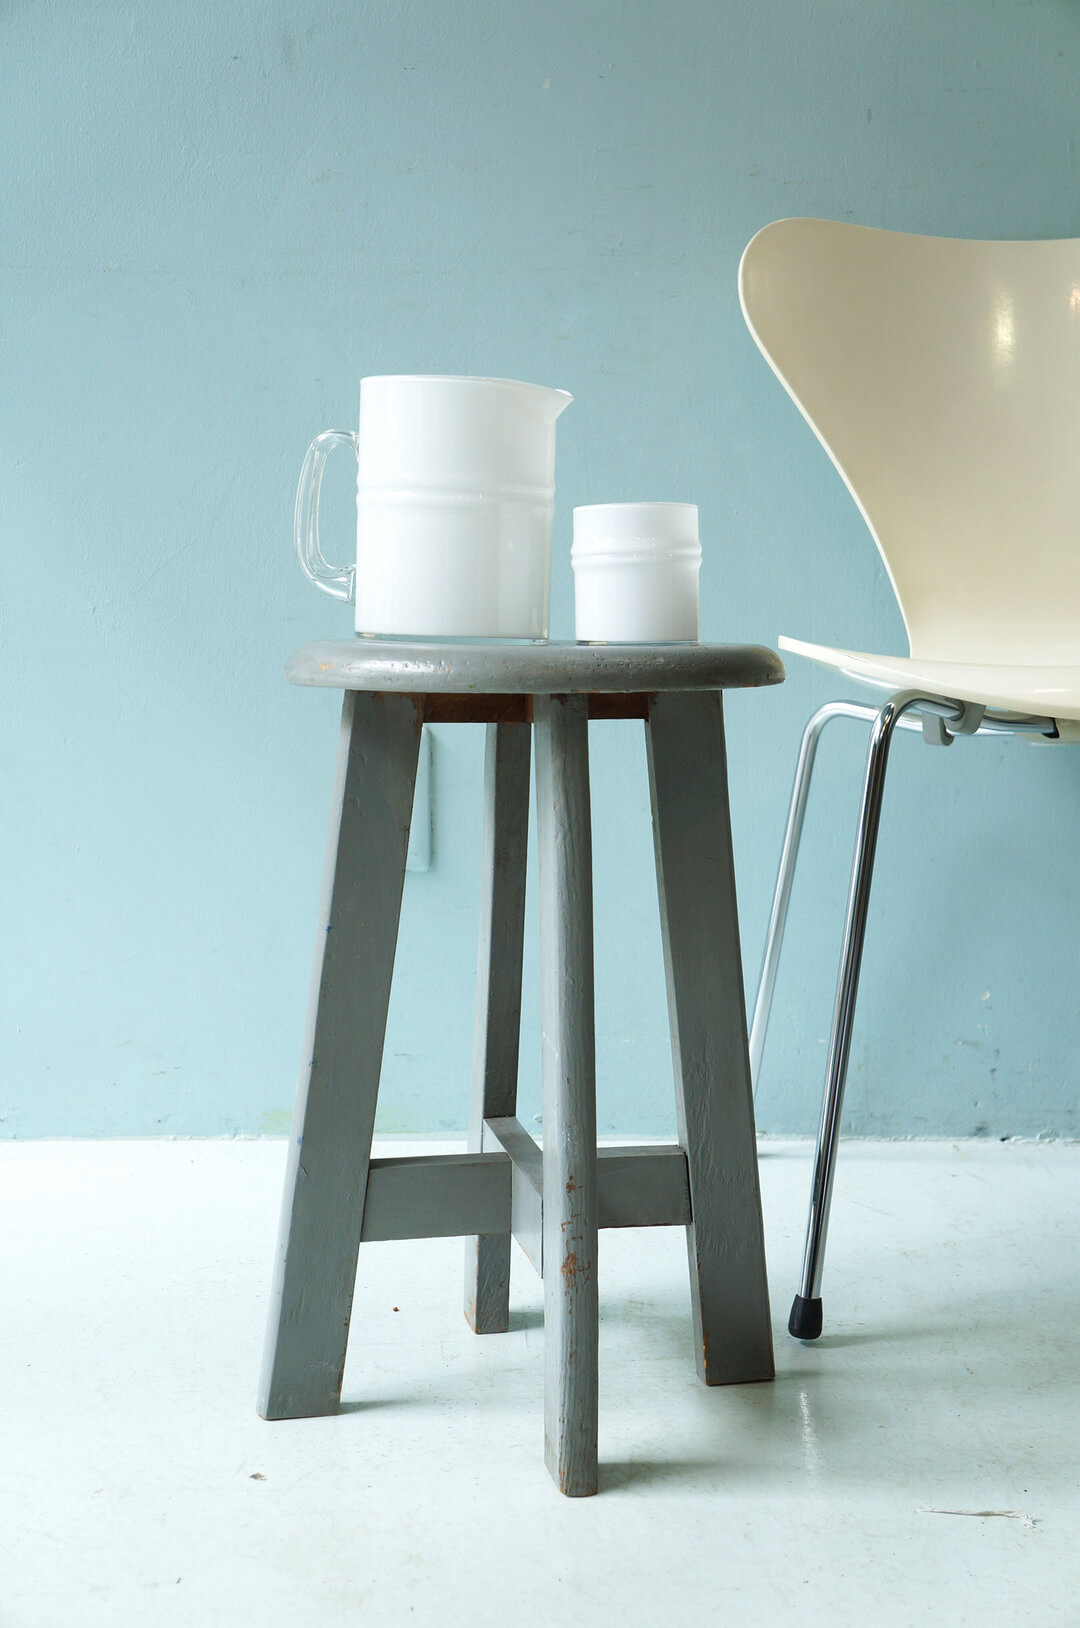 Vintage Round Atelier Stool Painted Gray/ヴィンテージ ラウンドアトリエスツール 丸椅子 グレーペイント シャビーシック 1